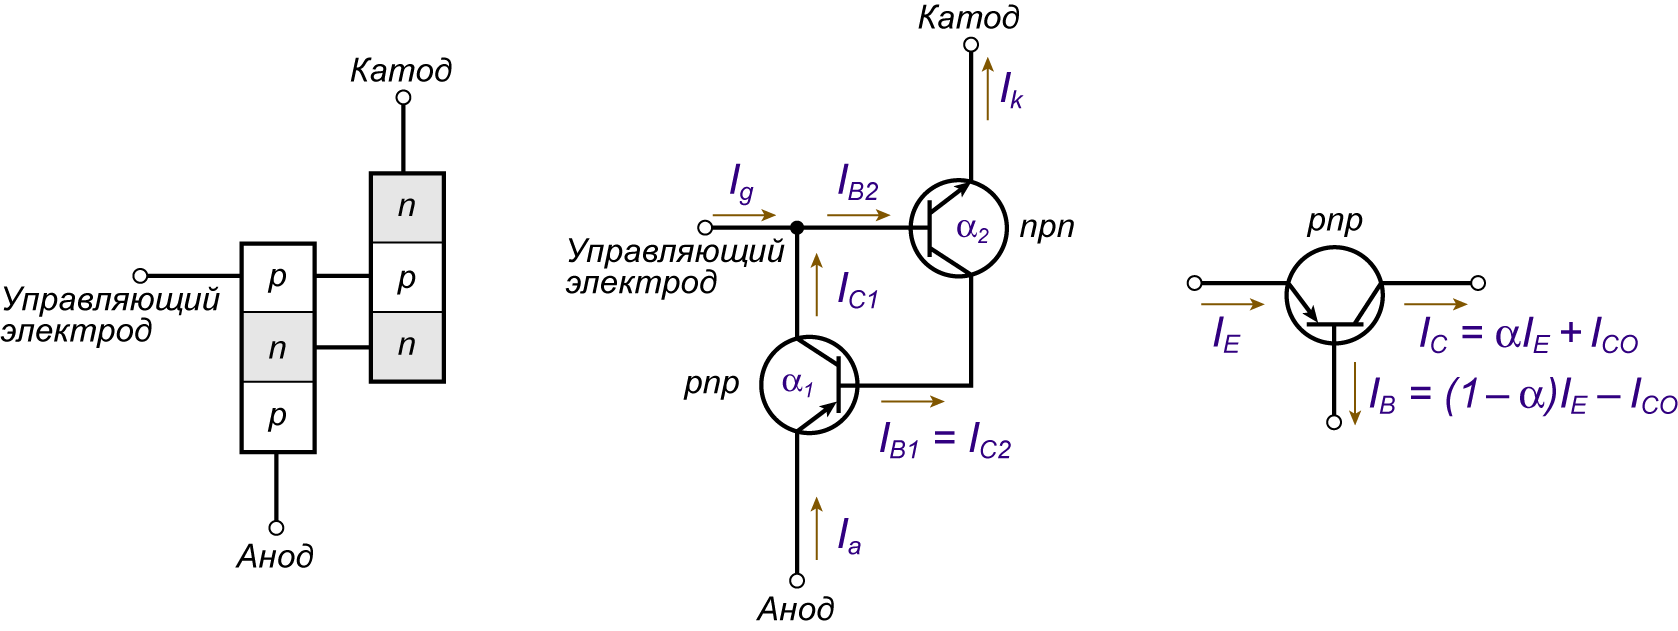 Включение реле через транзистор схема